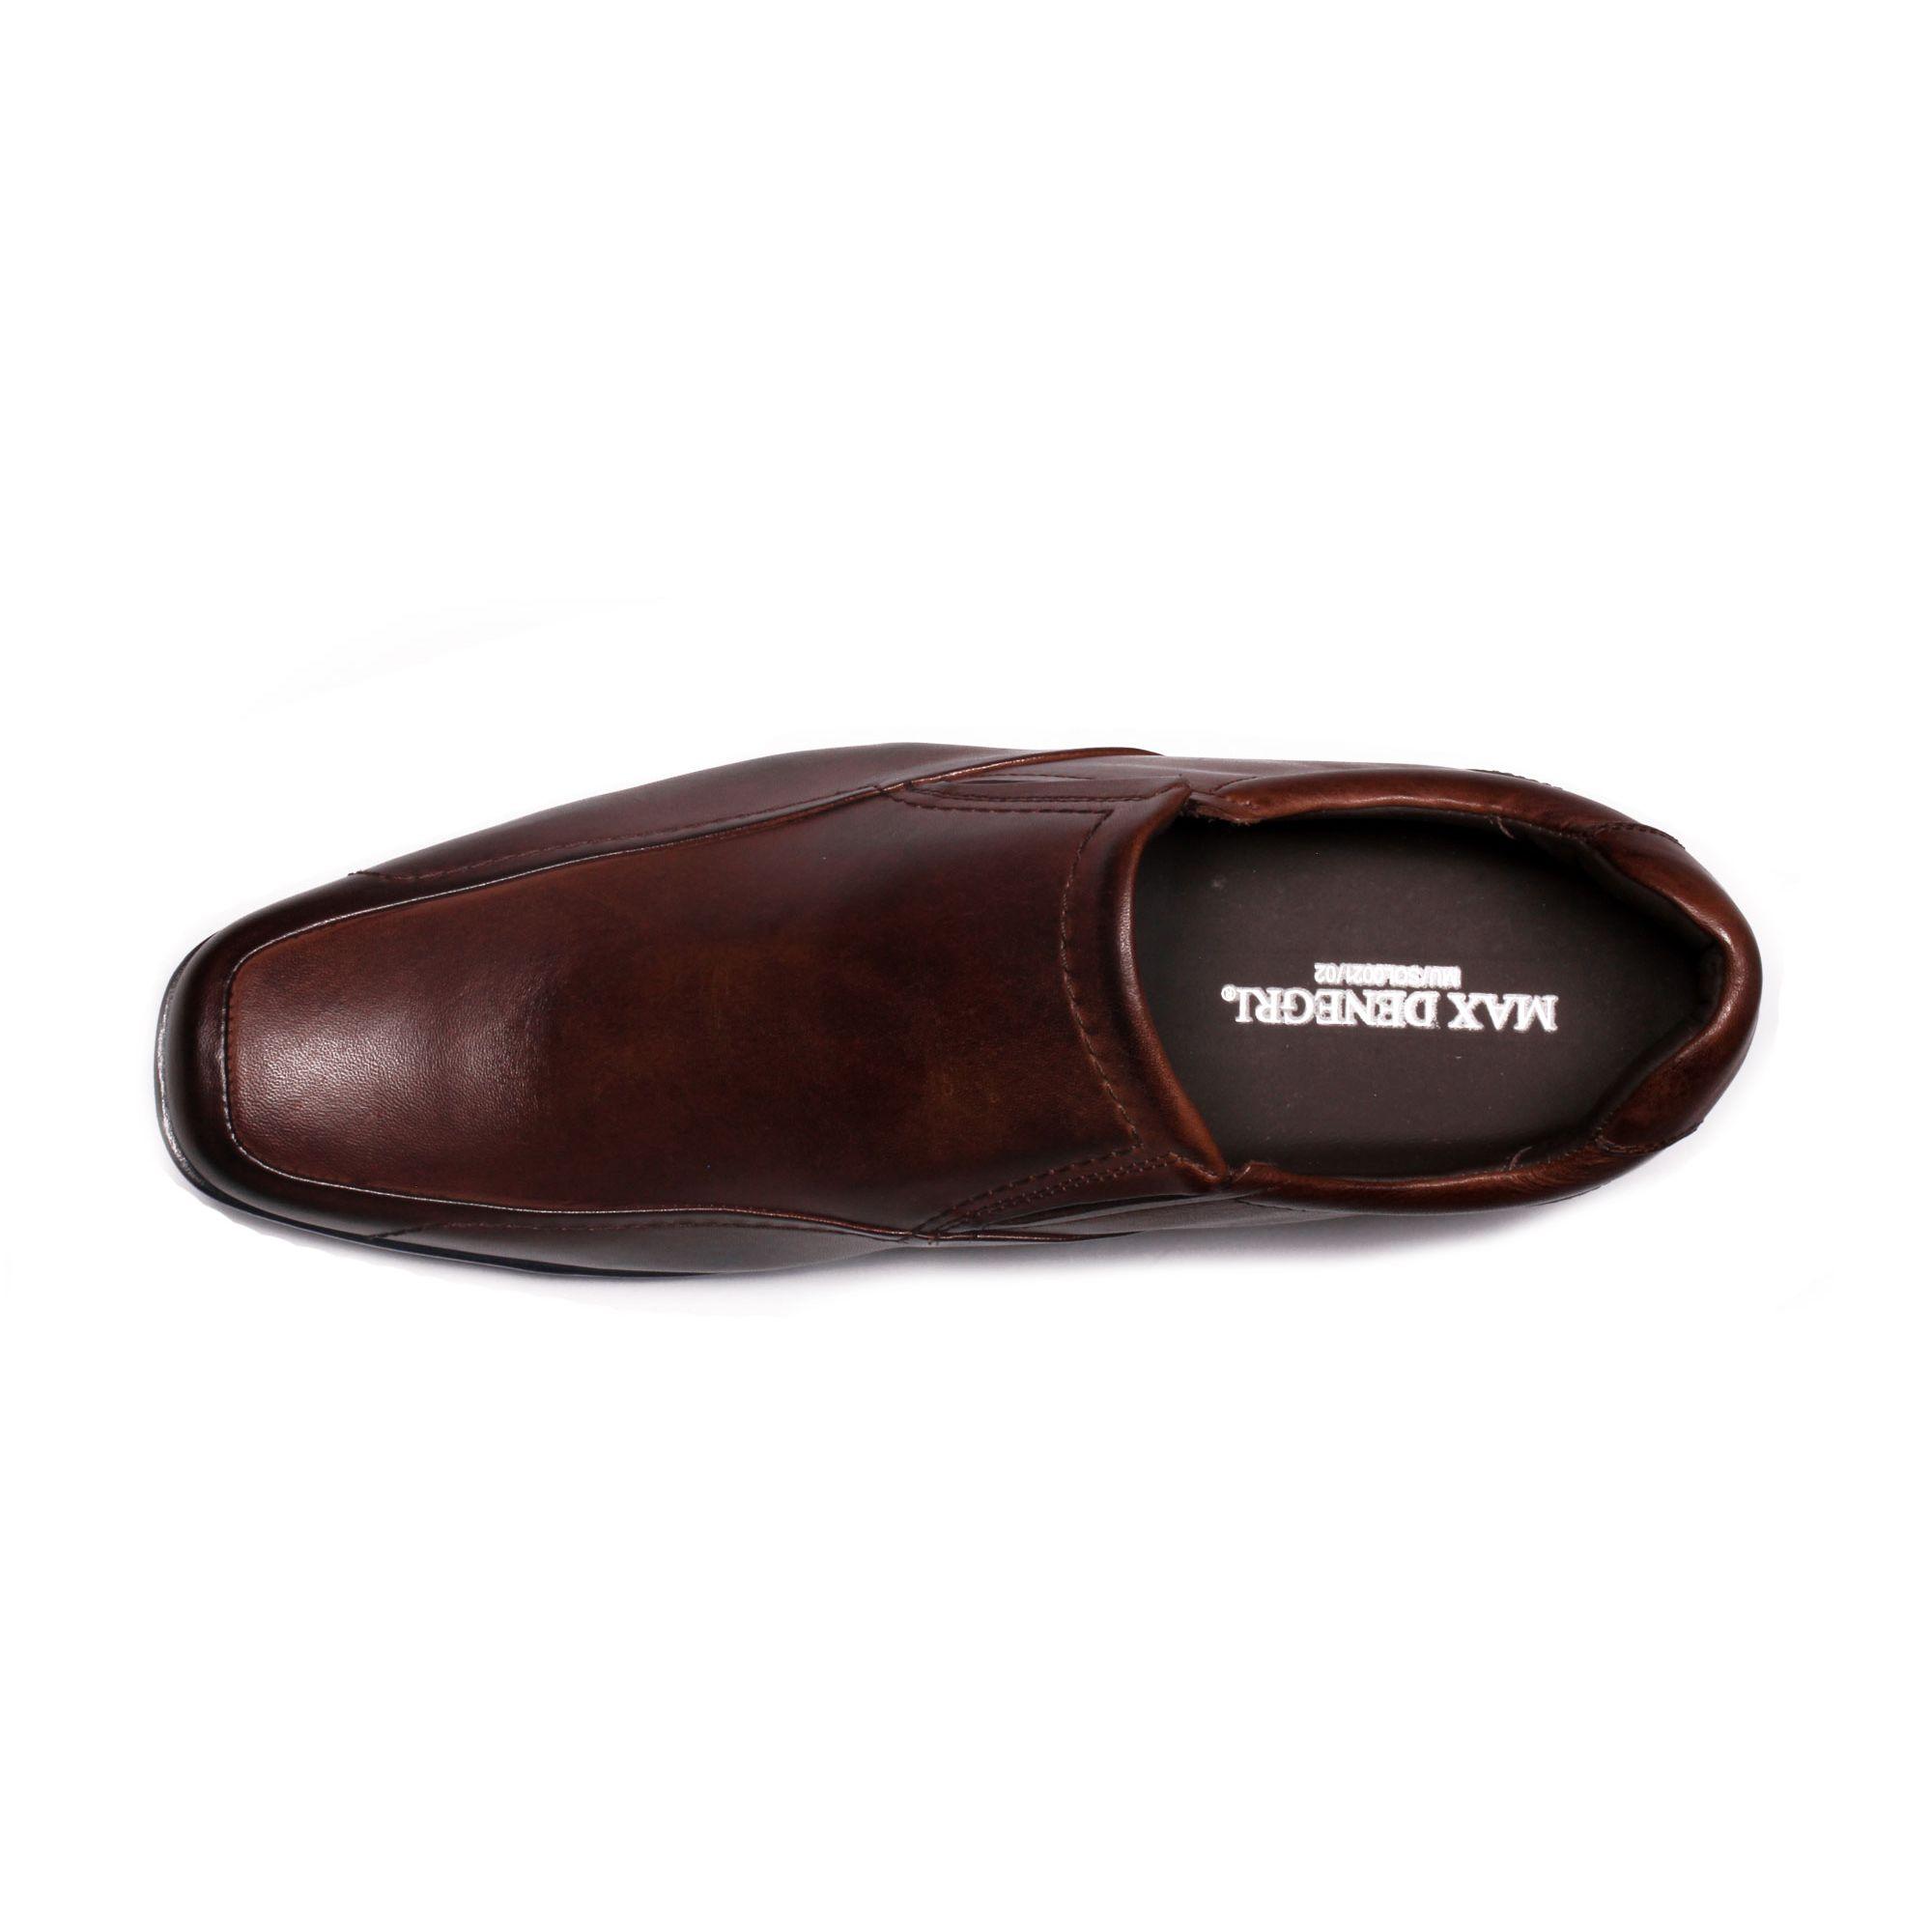 Zapato Formal Tabaco Café Max Denegri +7cm de Altura_70848